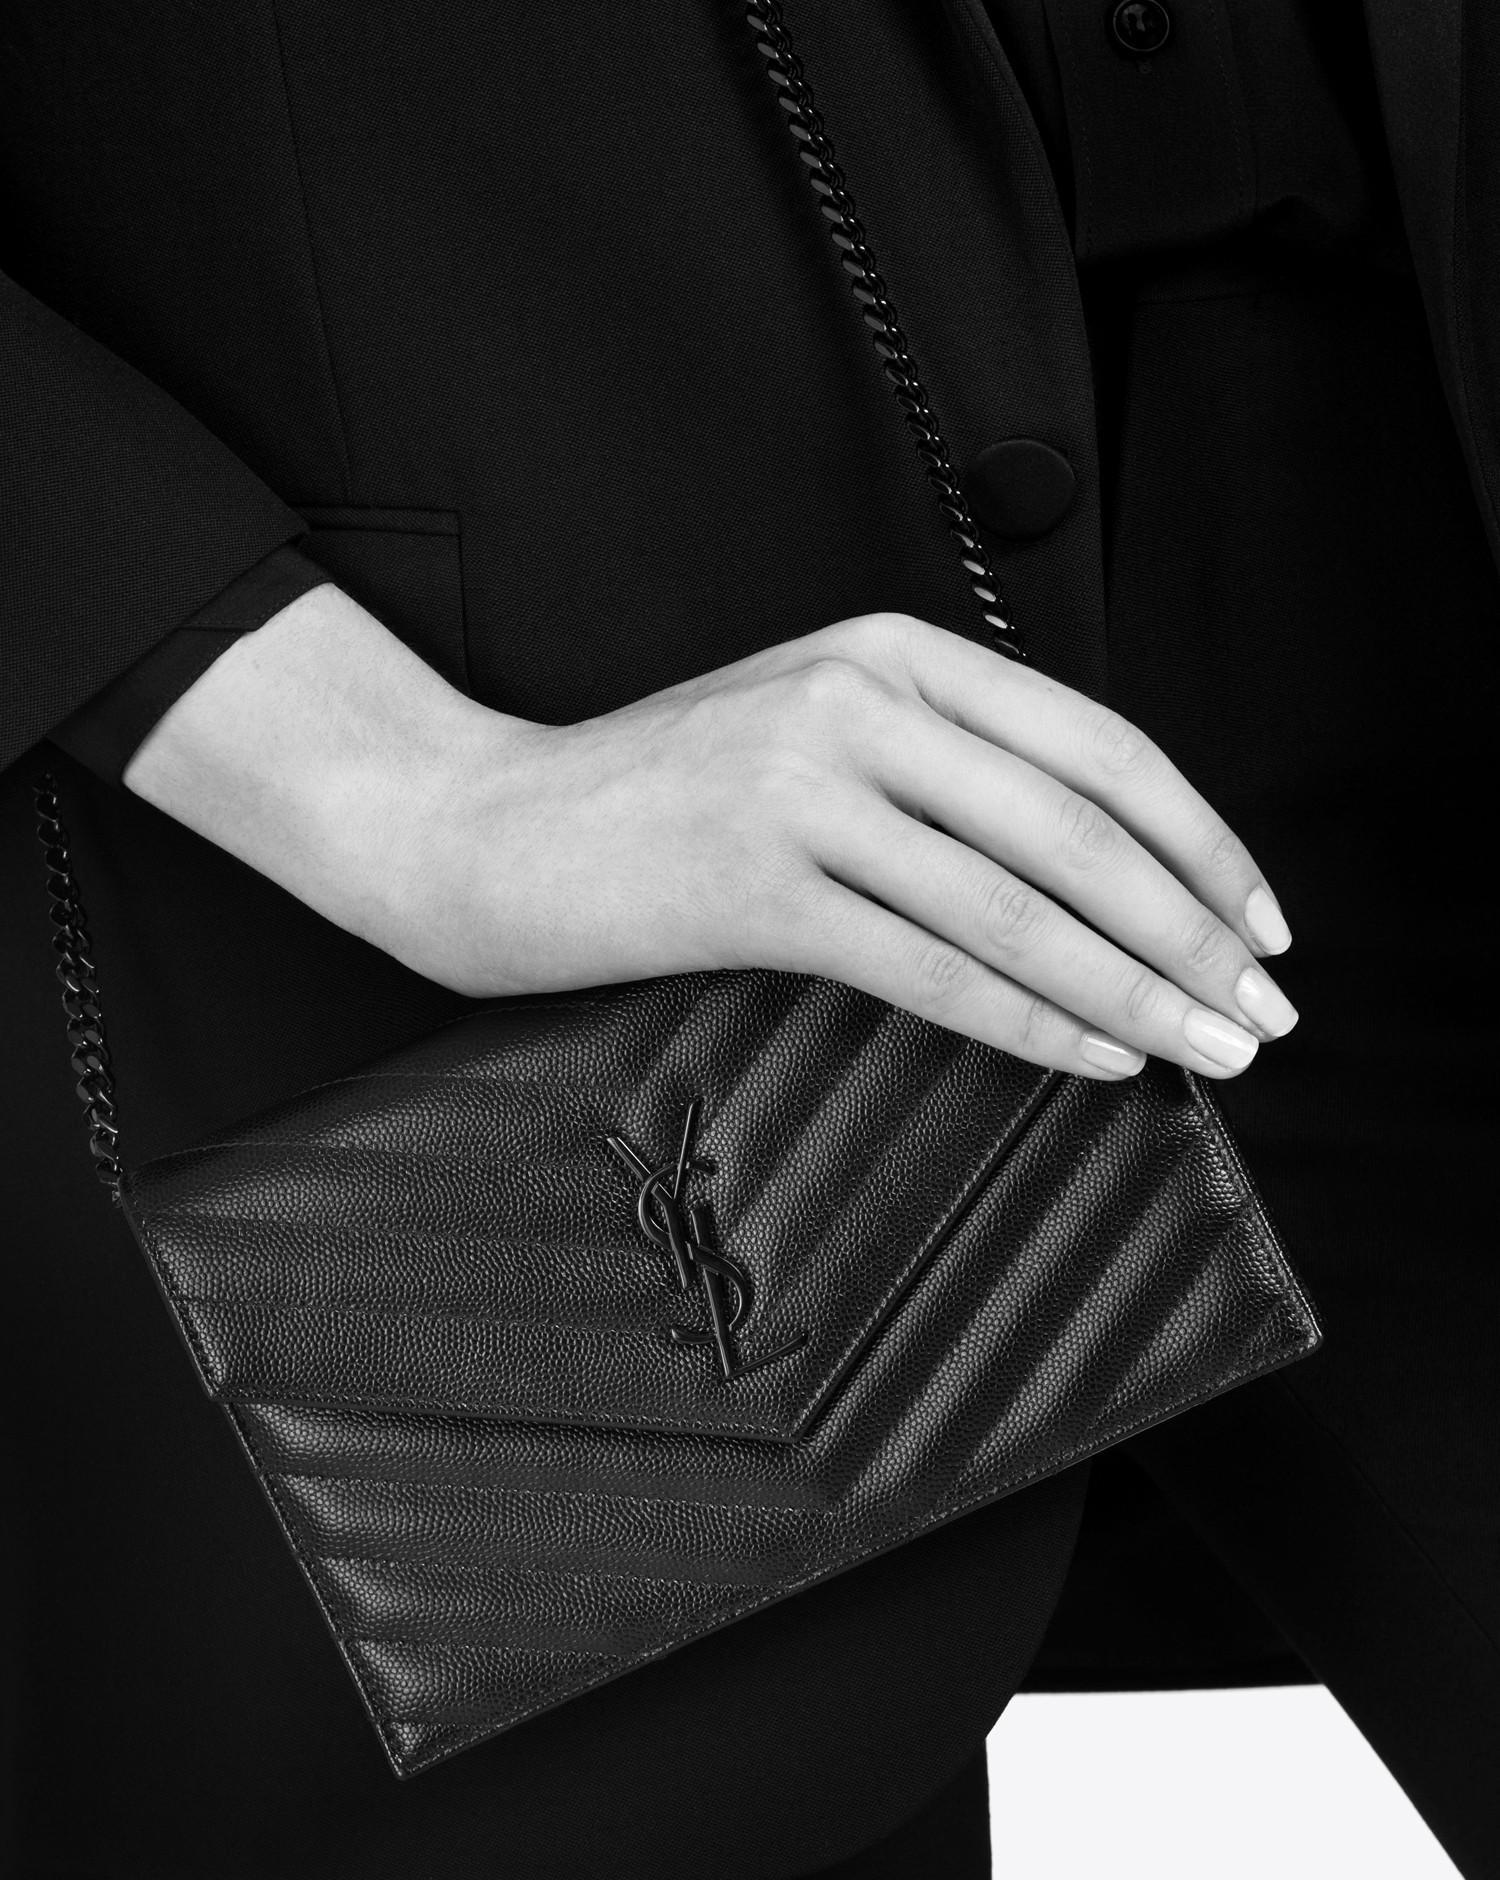 fe47f233167 Saint Laurent Envelope Chain Wallet In Grain De Poudre Embossed Leather in  Black - Lyst